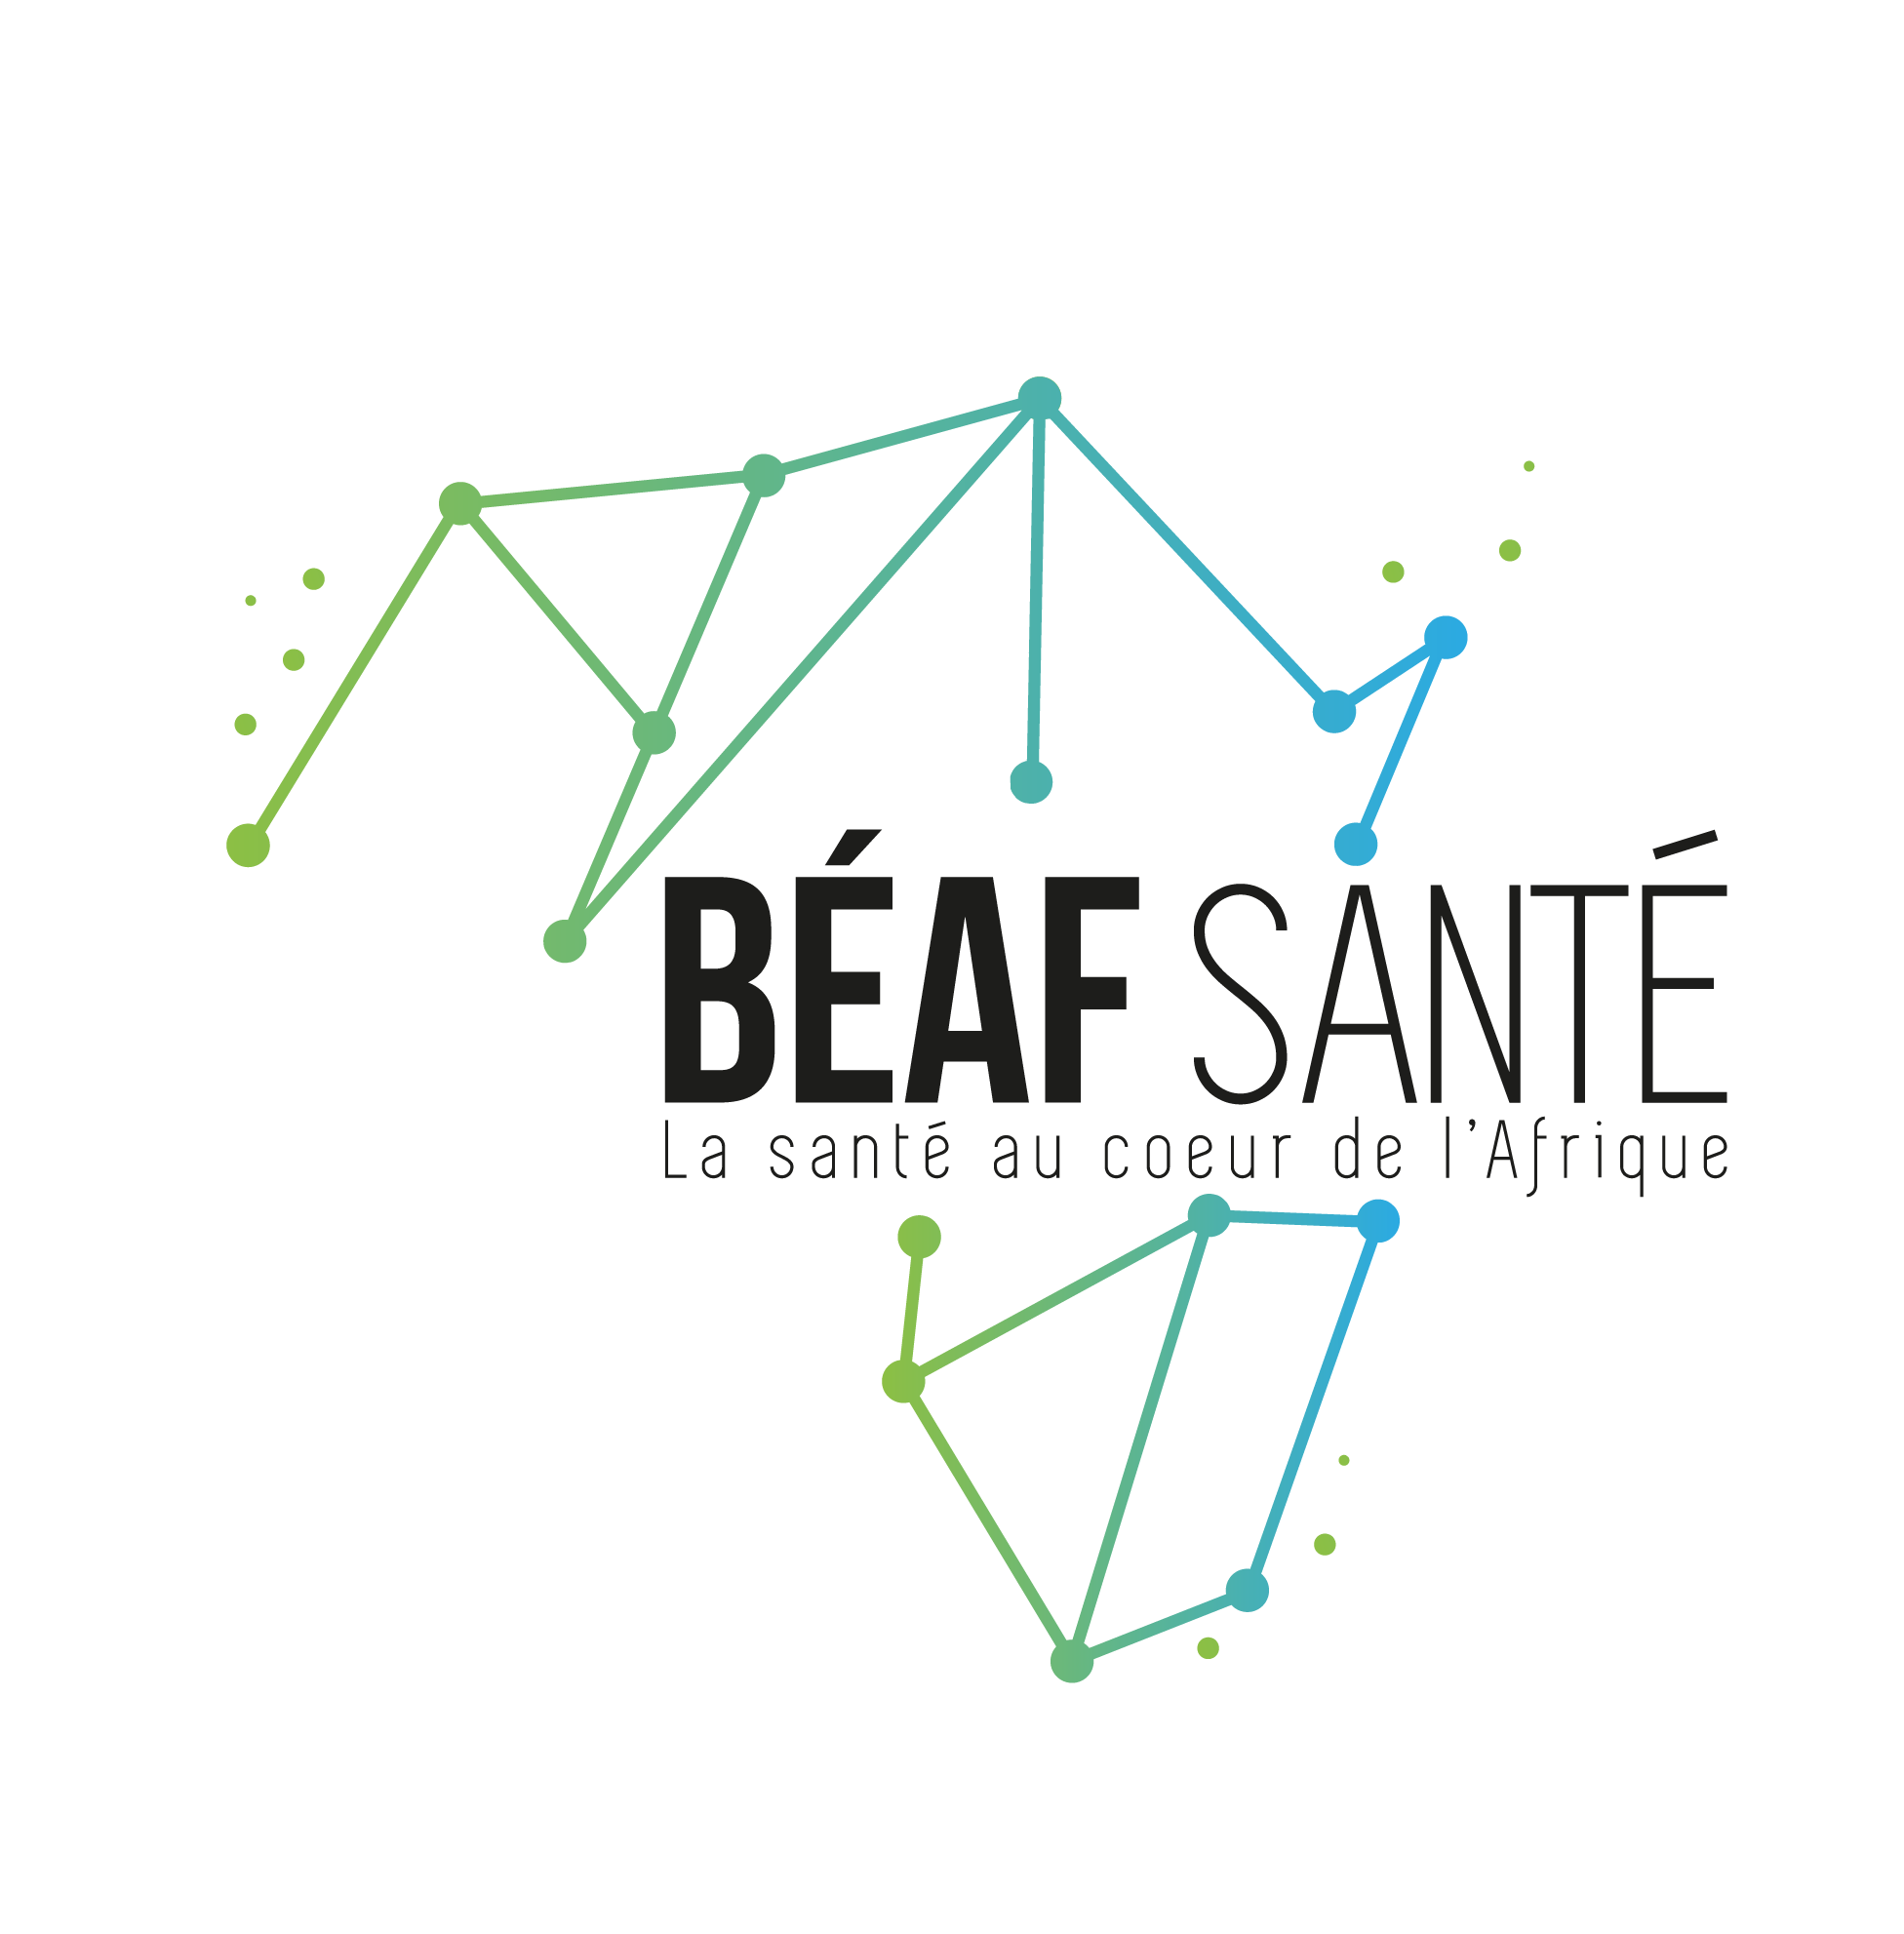 image_thumb_Centre d'analyses biomédicales Centrafrique